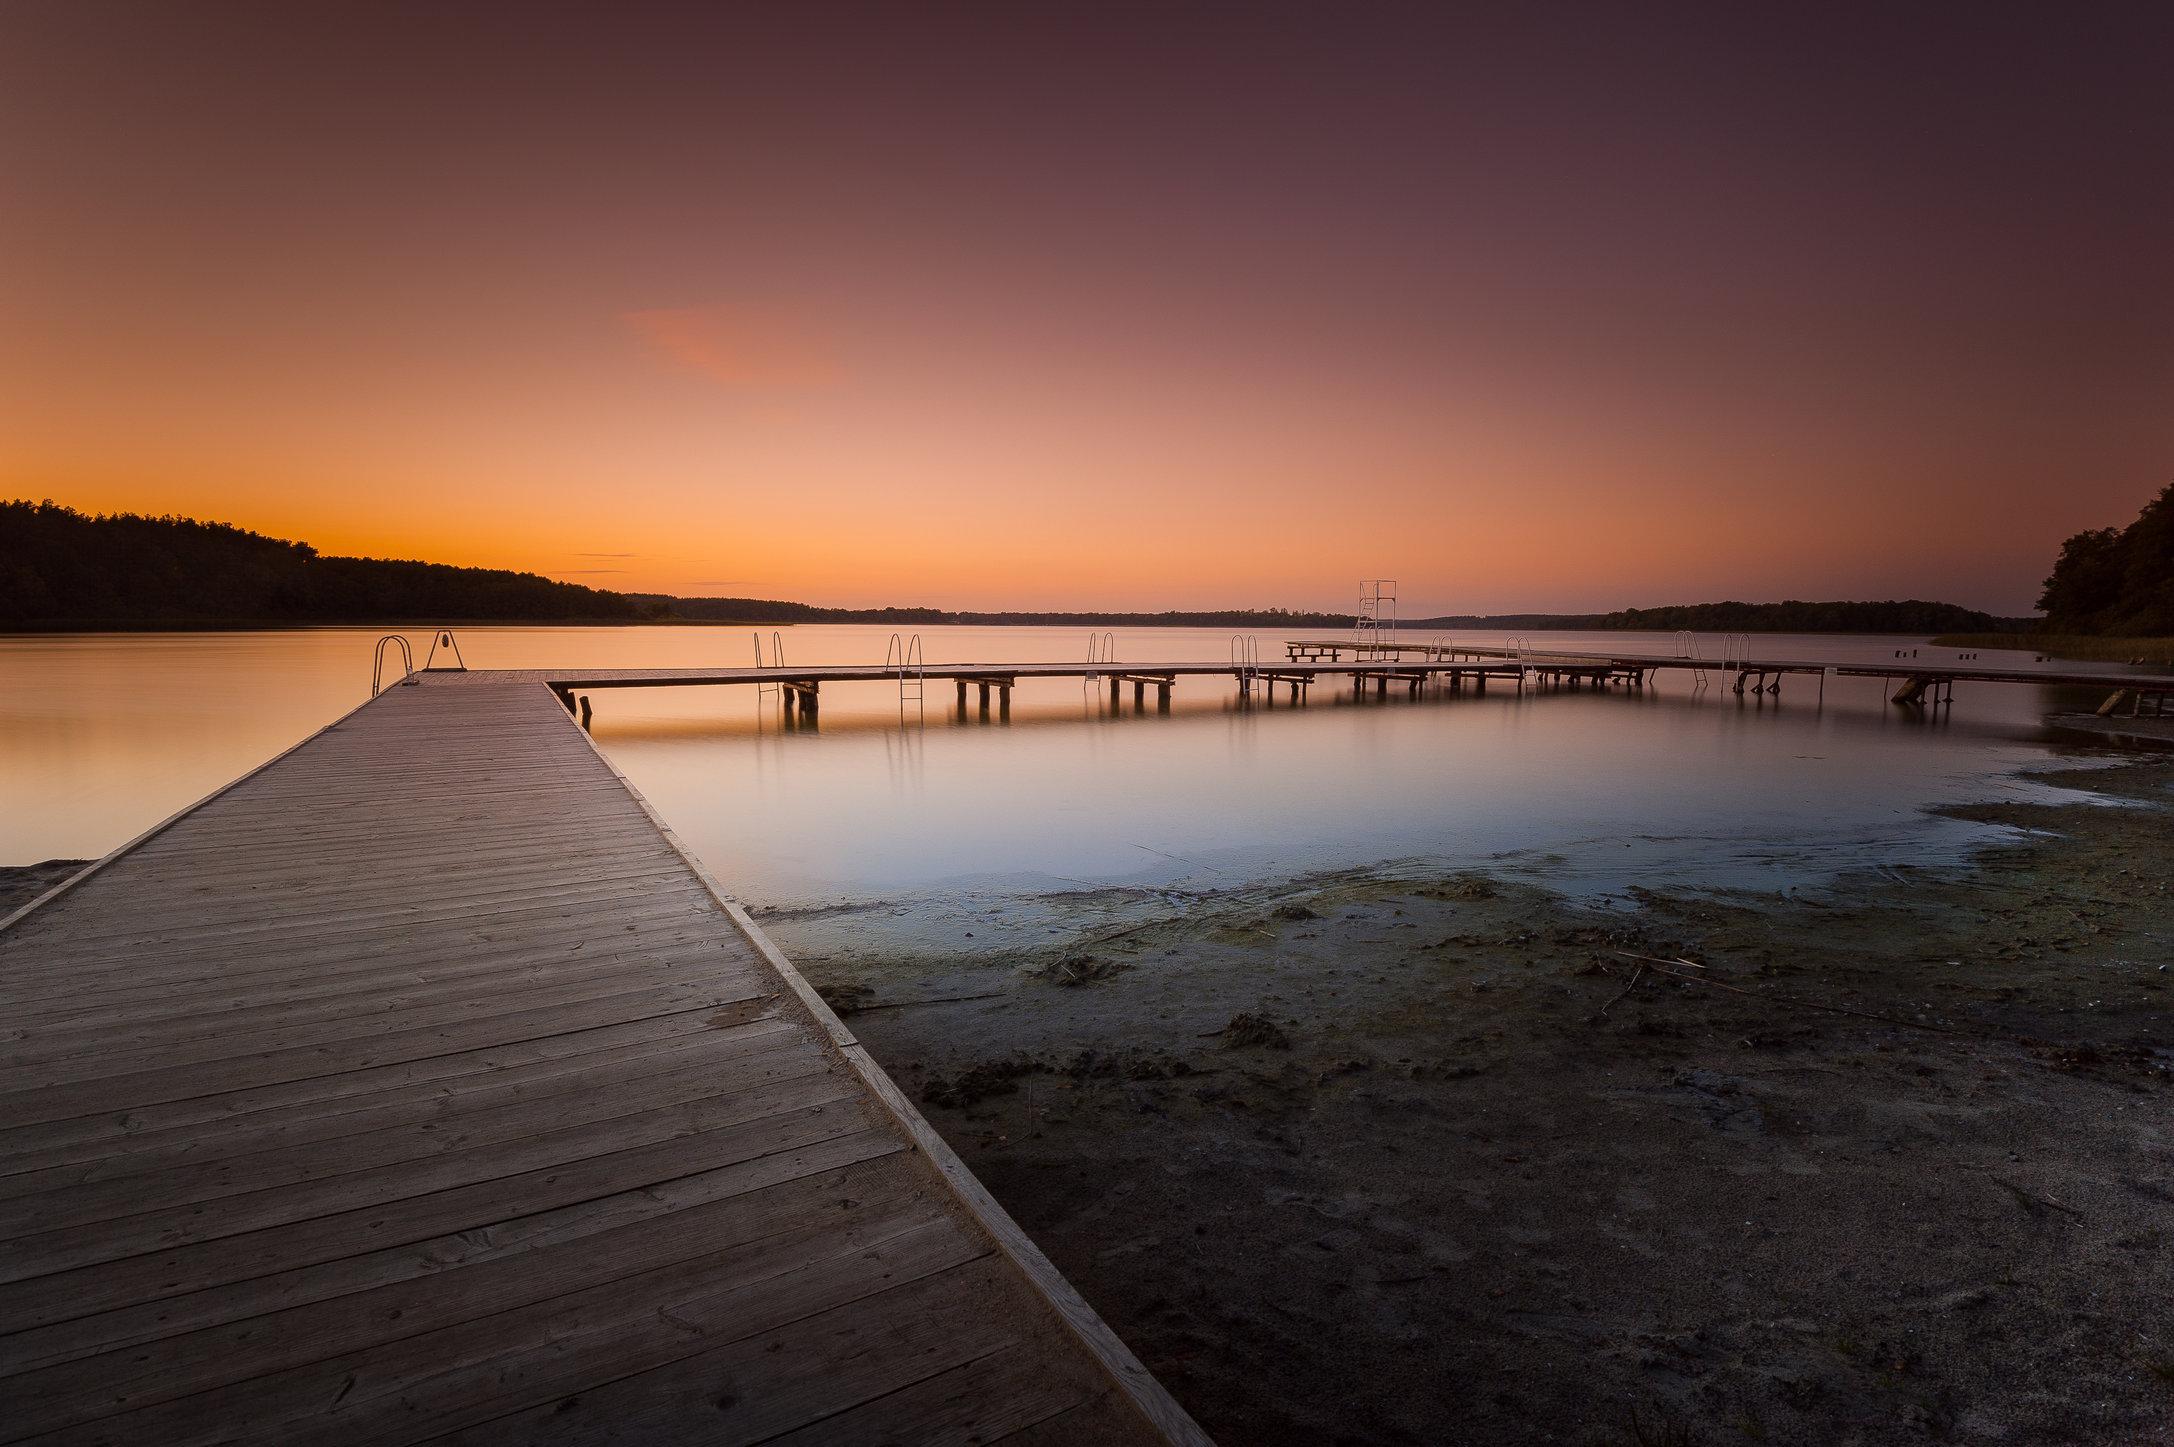 Lake Siecino-MASTER COPY.jpg